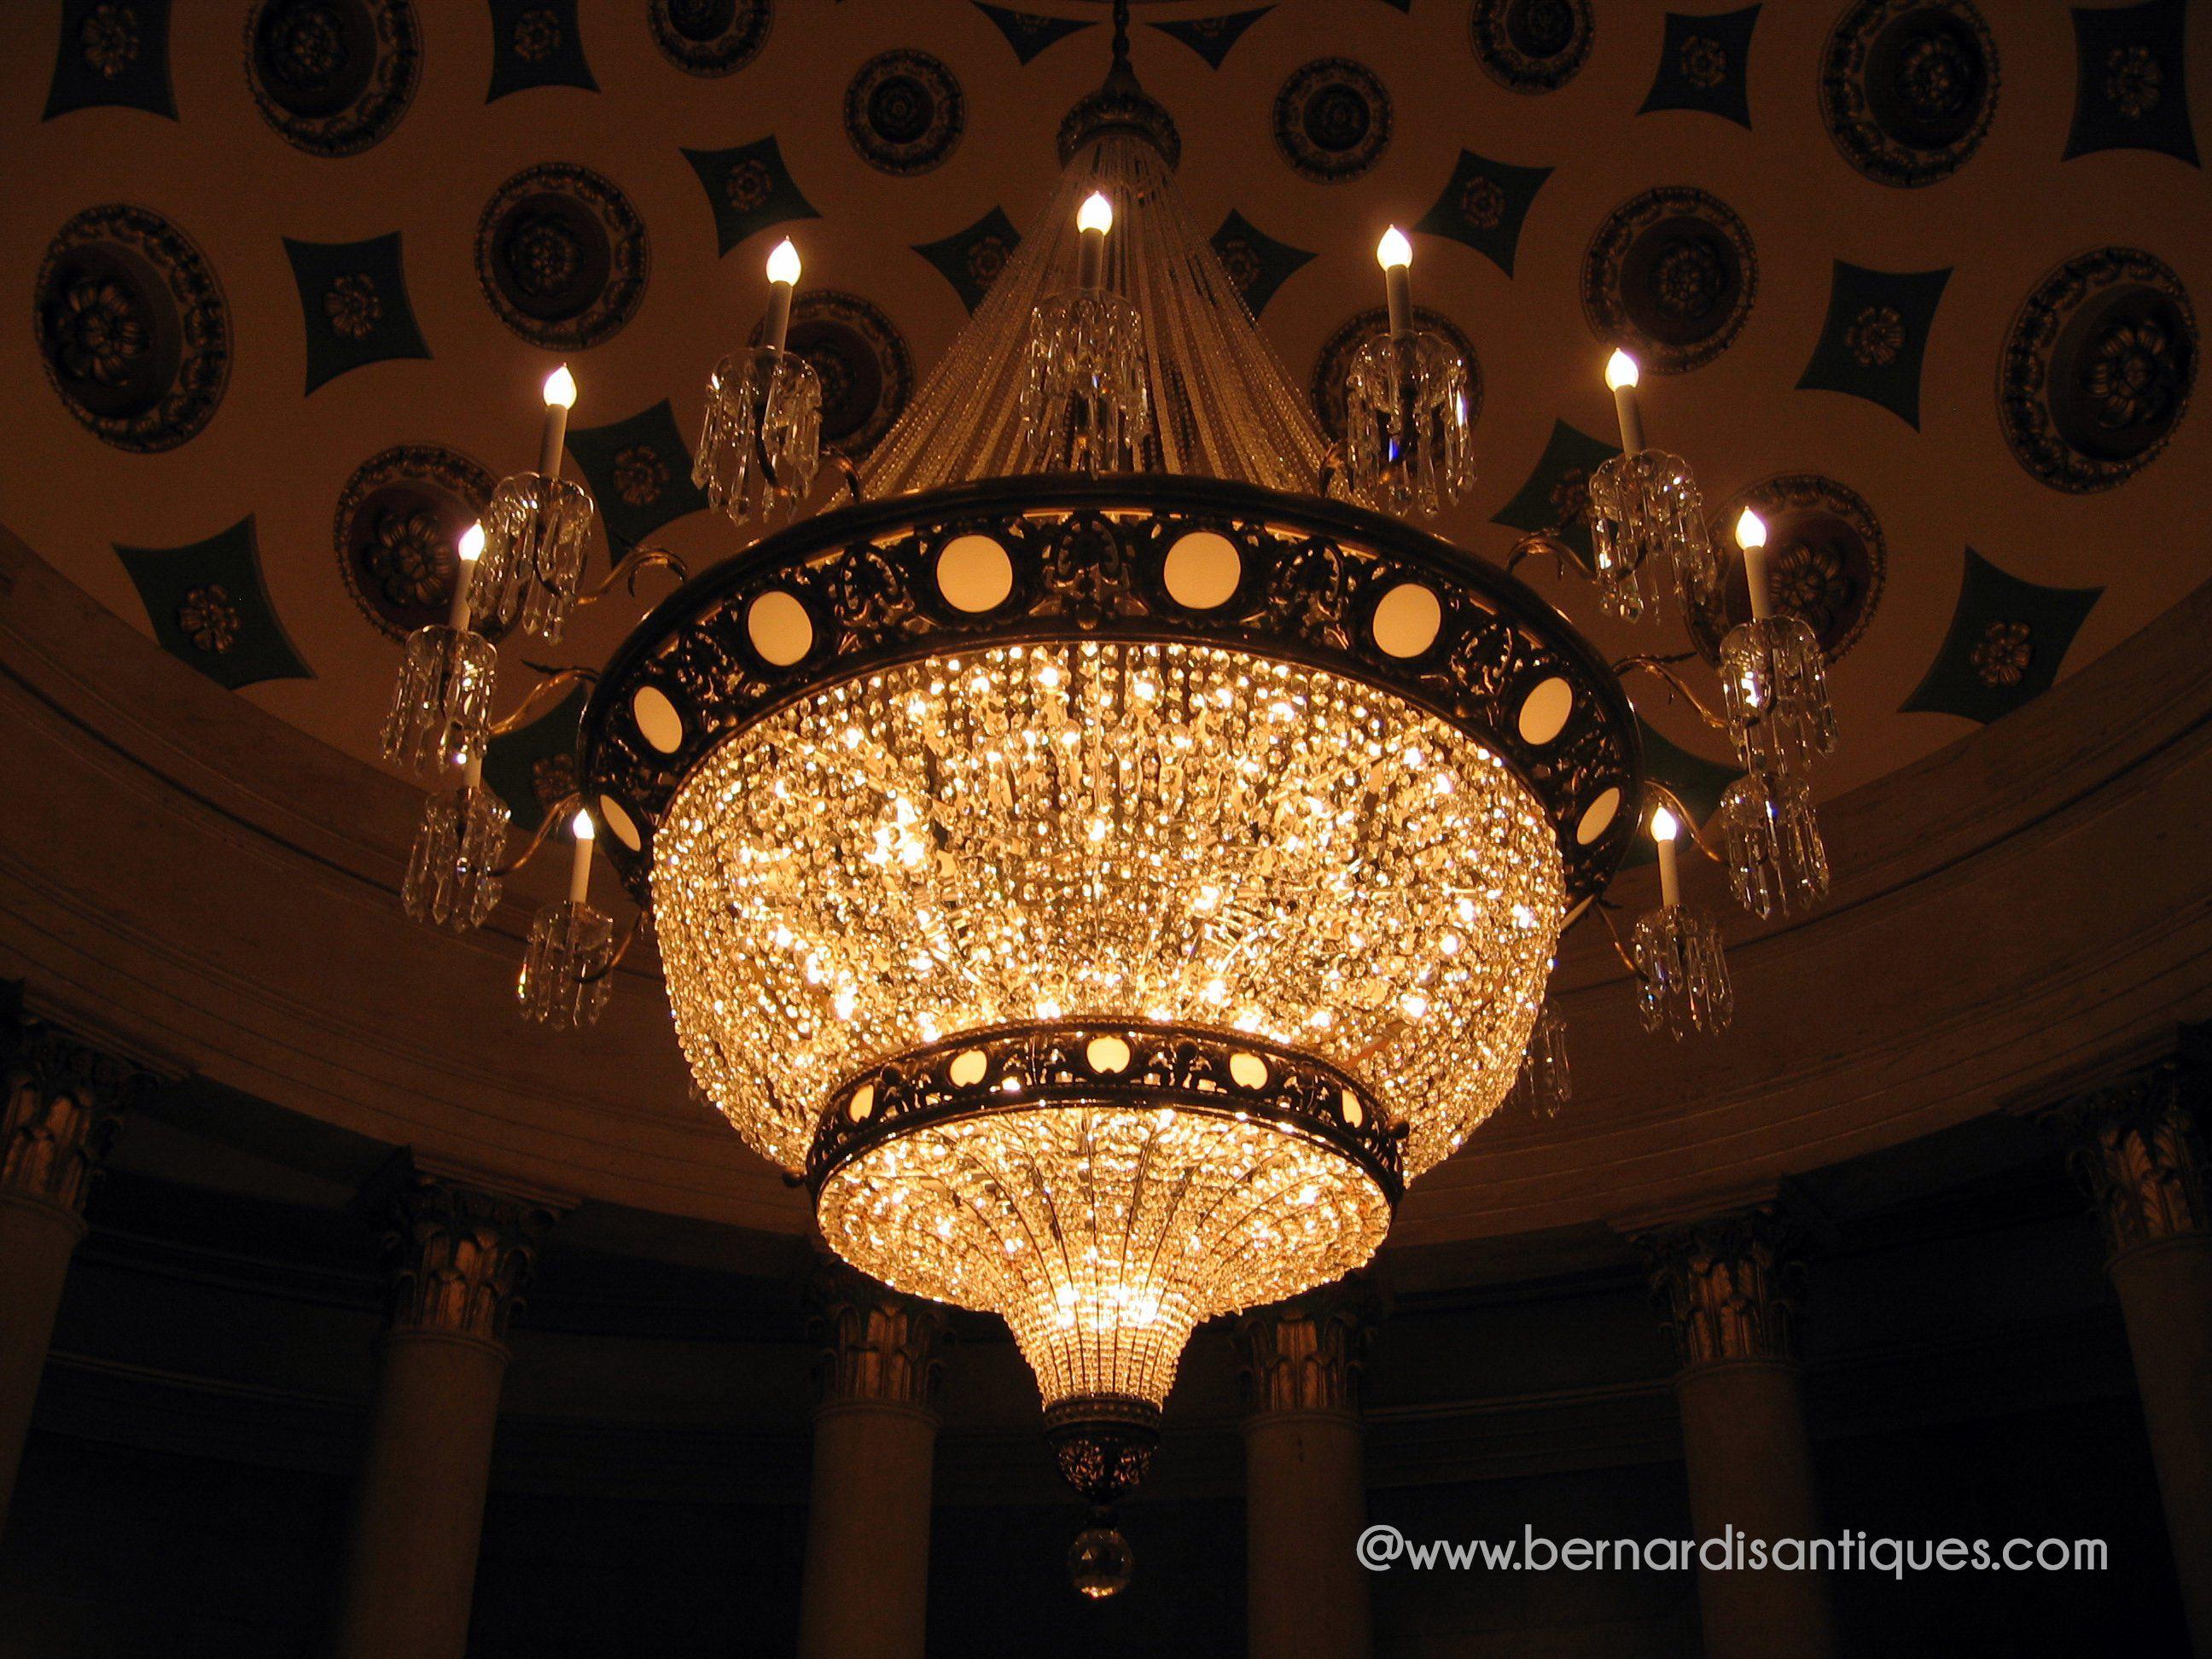 Explore Chandelier Lamps, Antique Chandelier, And More!